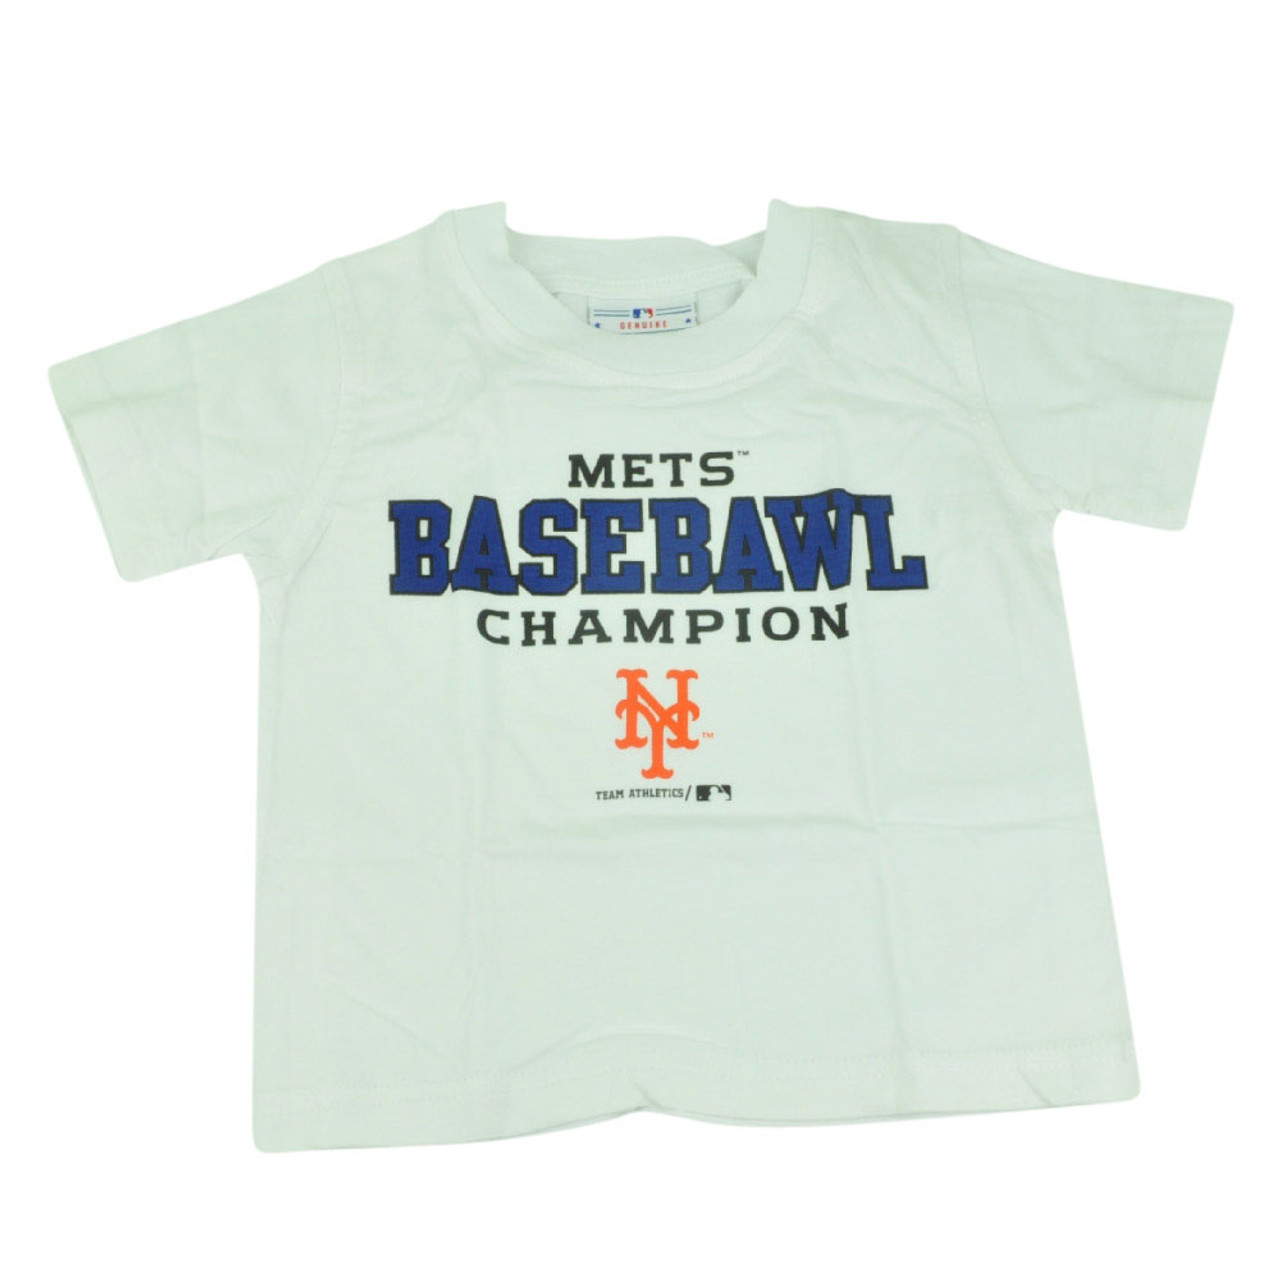 ccc8c562 MLB New York Mets NY Baseball Champion Toddler Tshirt Tee White Boys Shirt  - Cap Store Online.com